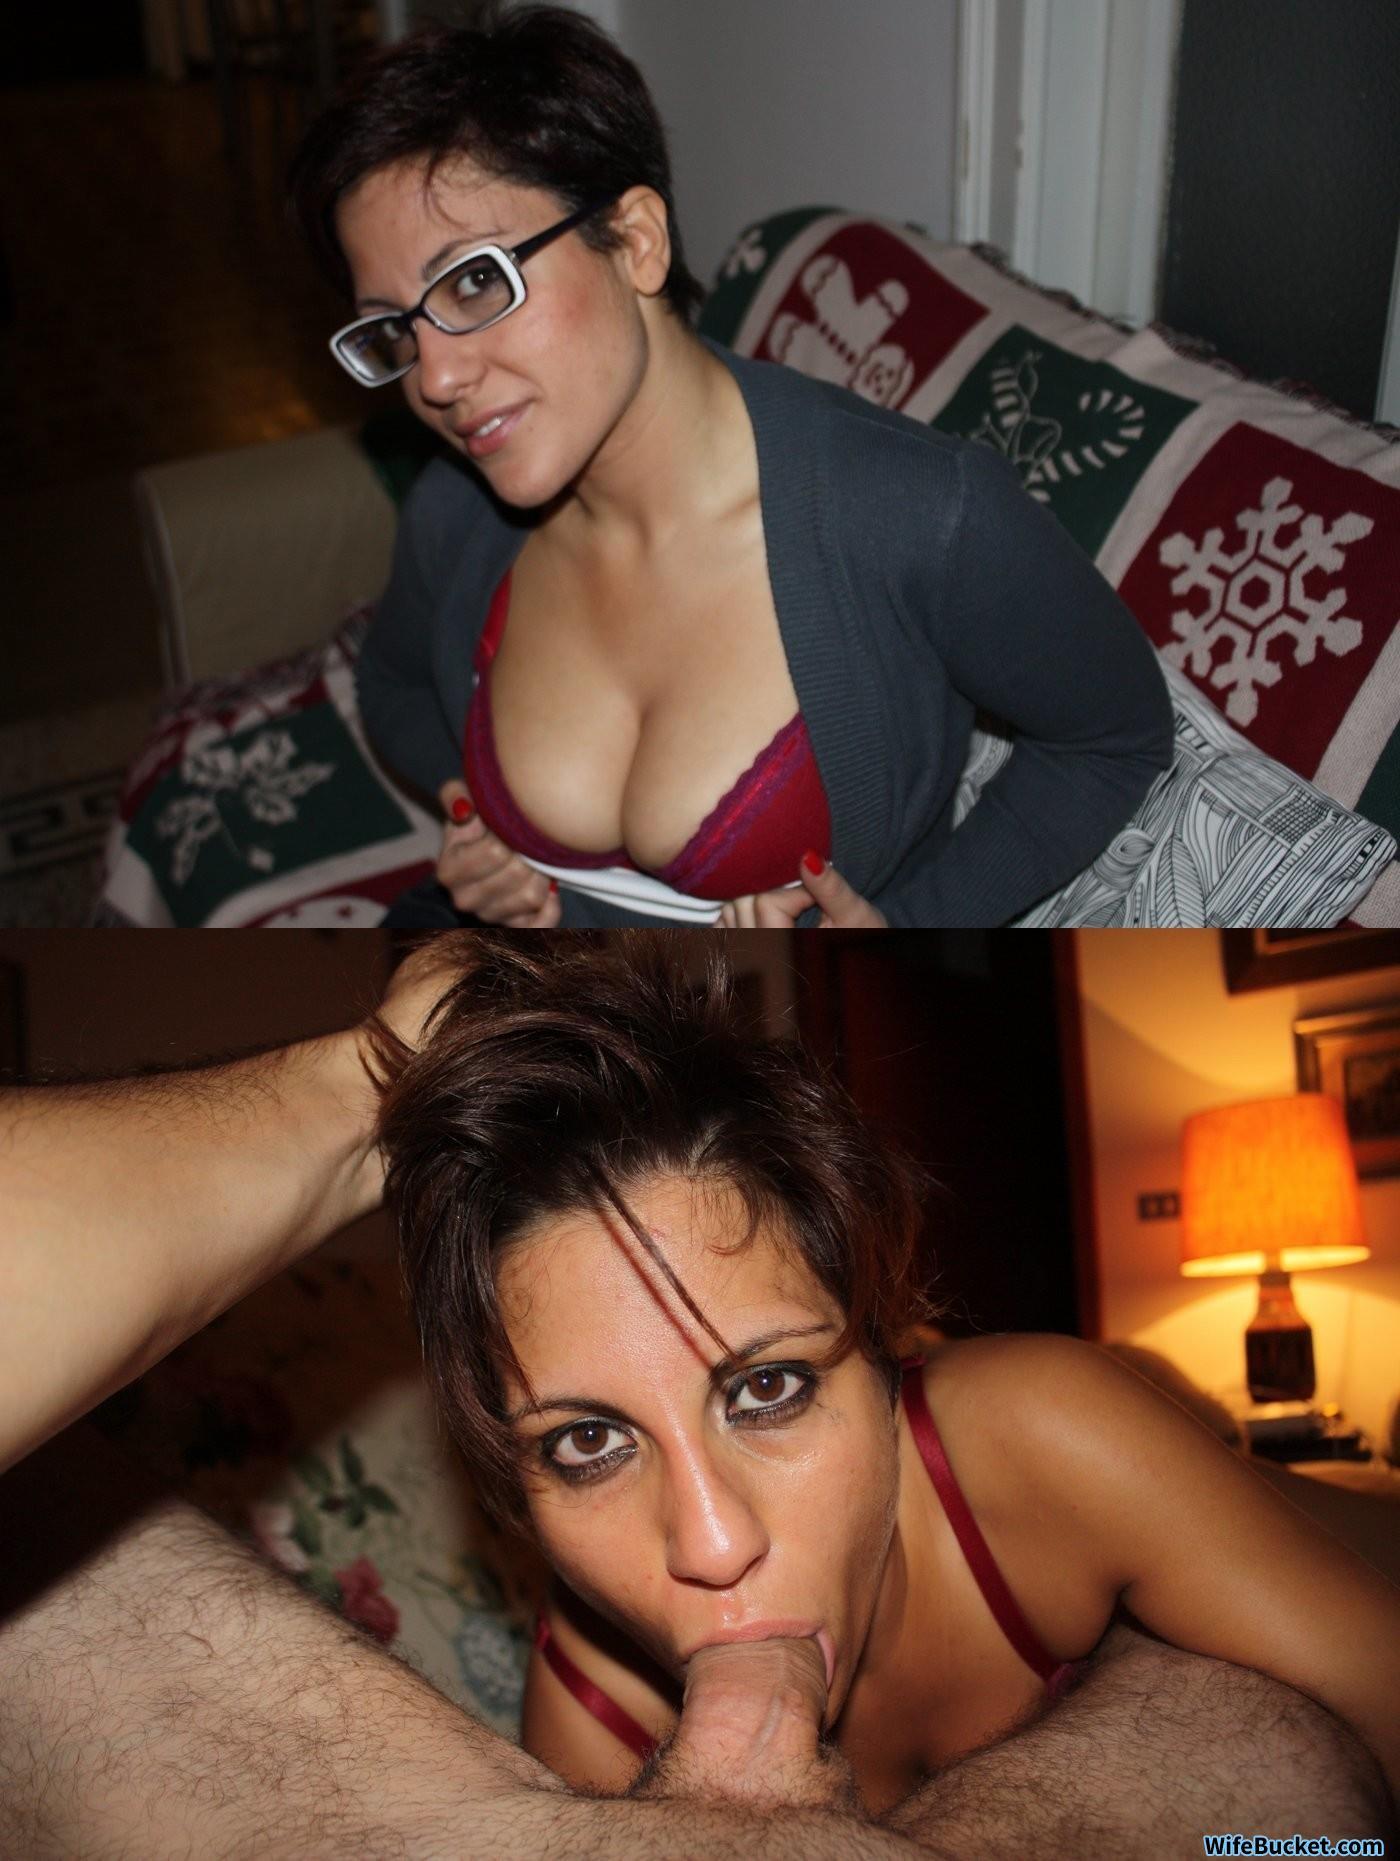 Wife amateur sex pic archives